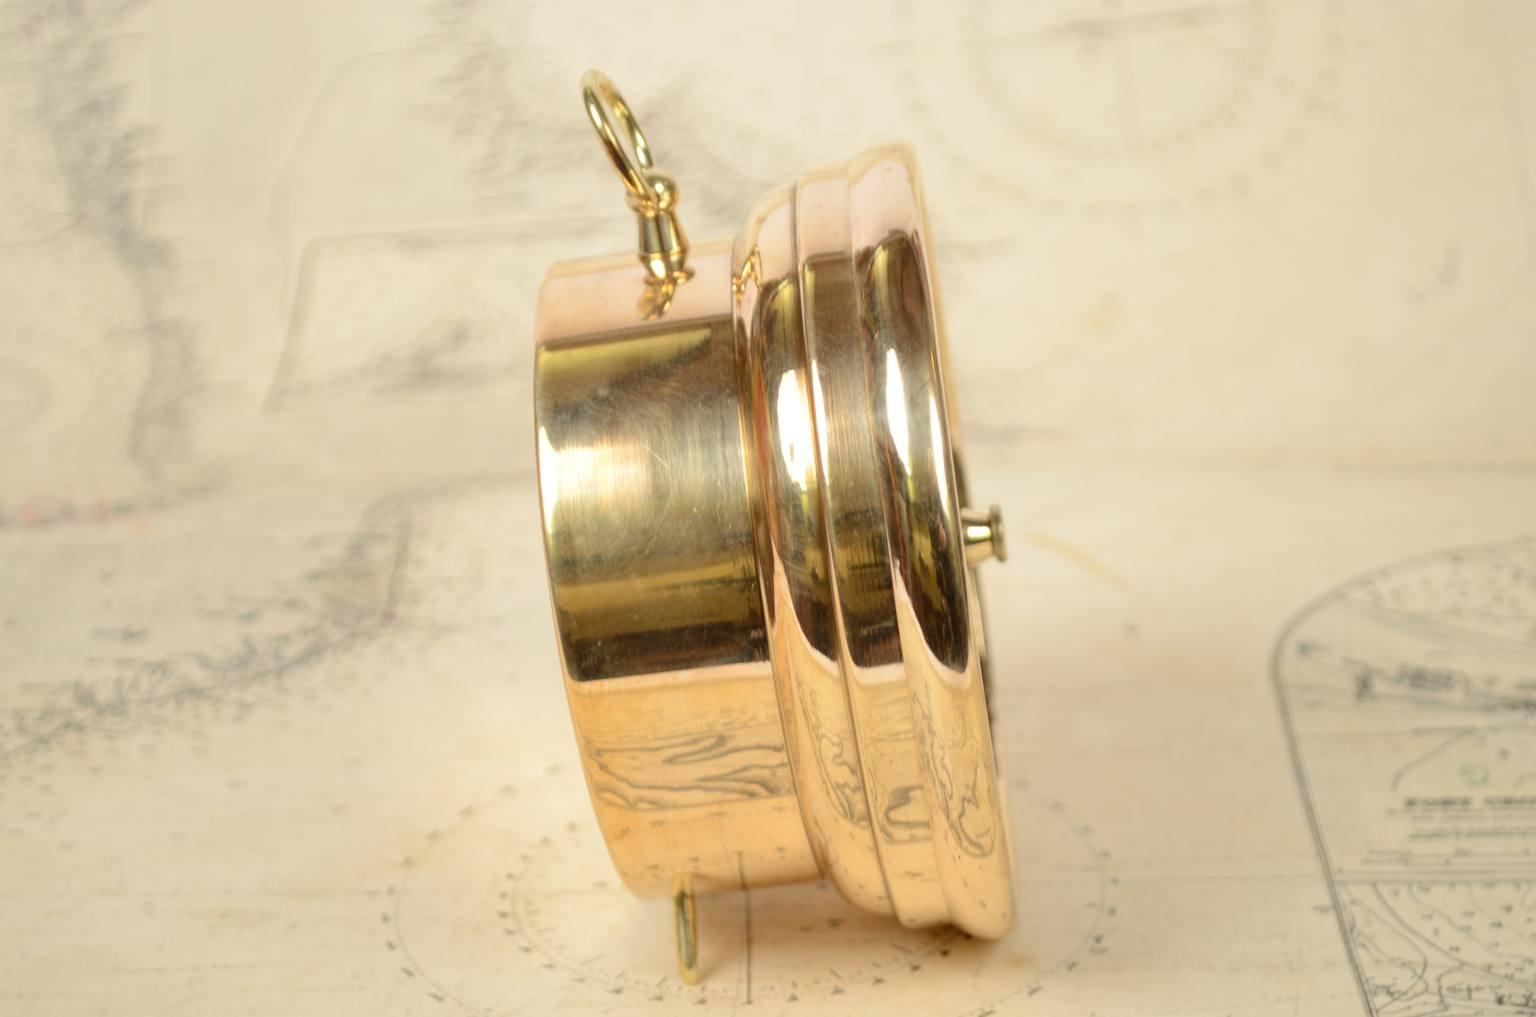 Barometri antichi/6148-Barometro antico